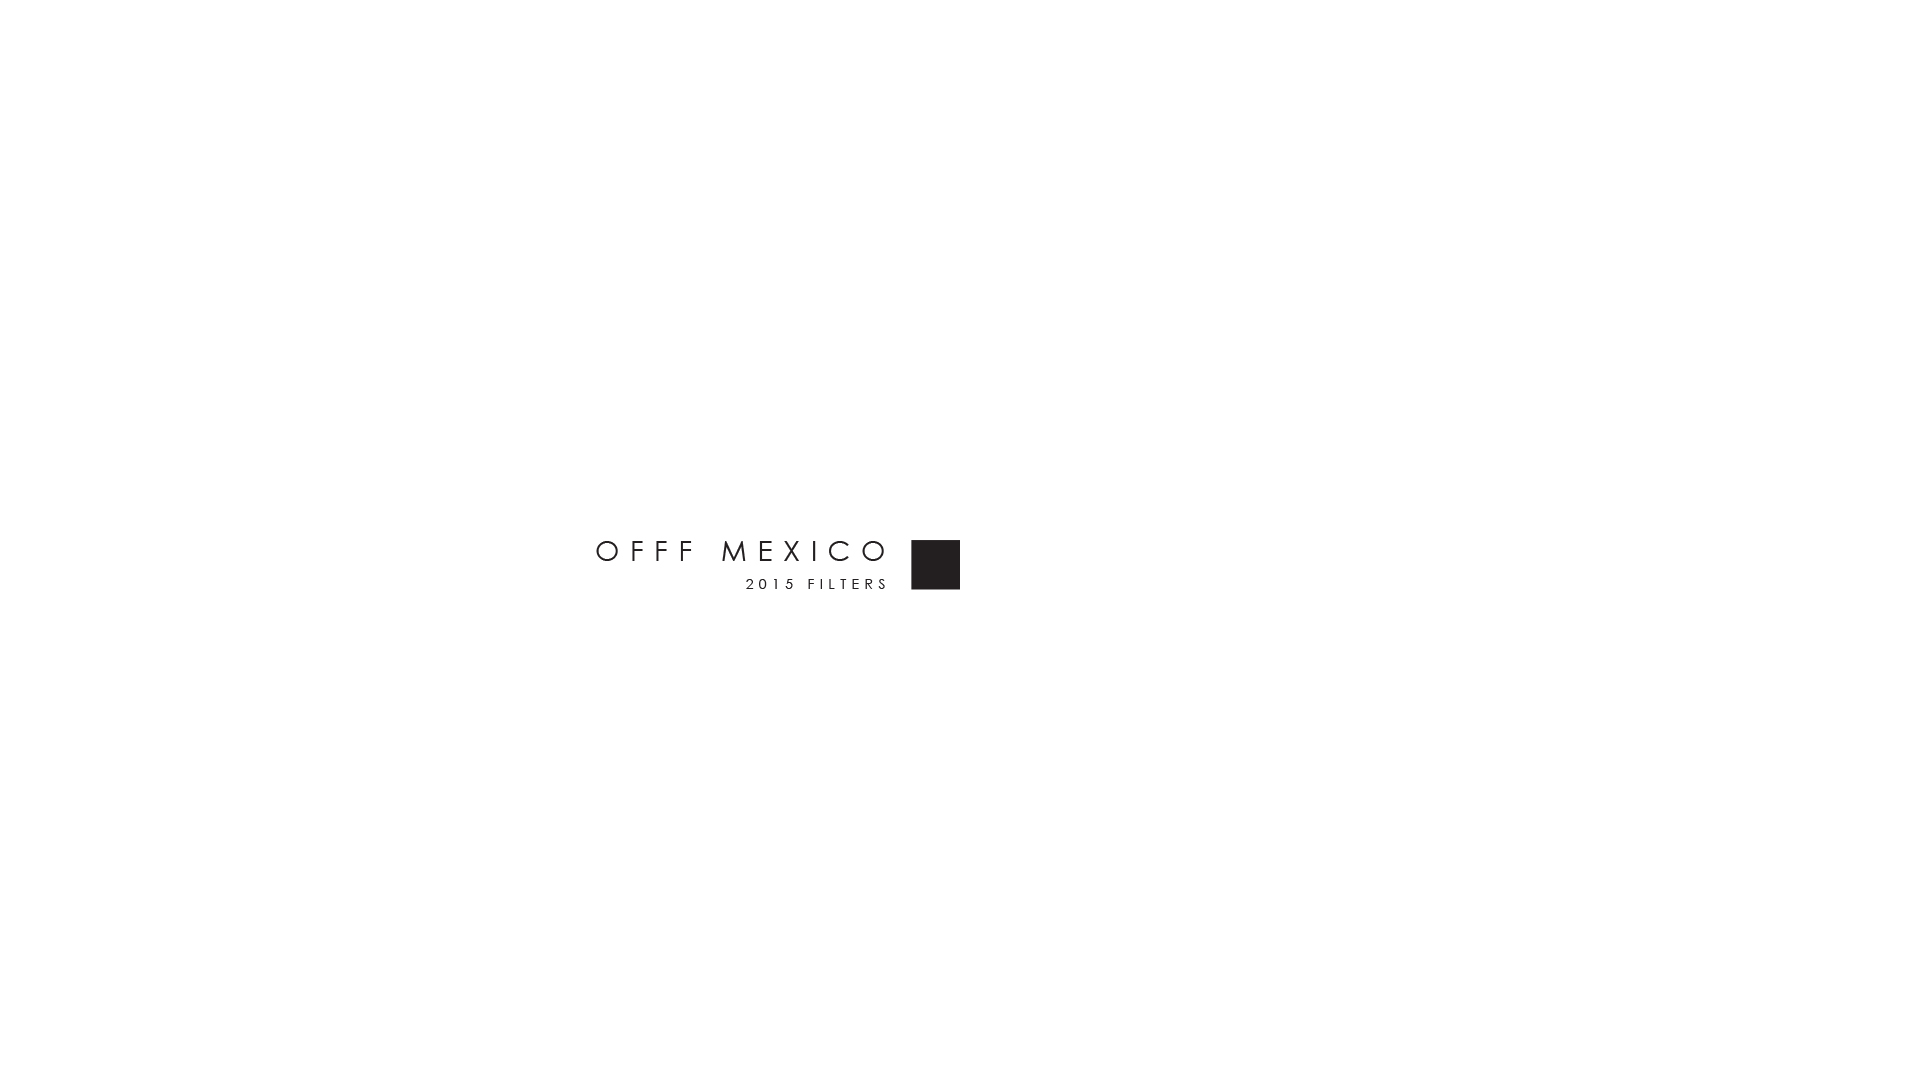 OFFFMexico_Interface_Exploration_v004.jpg